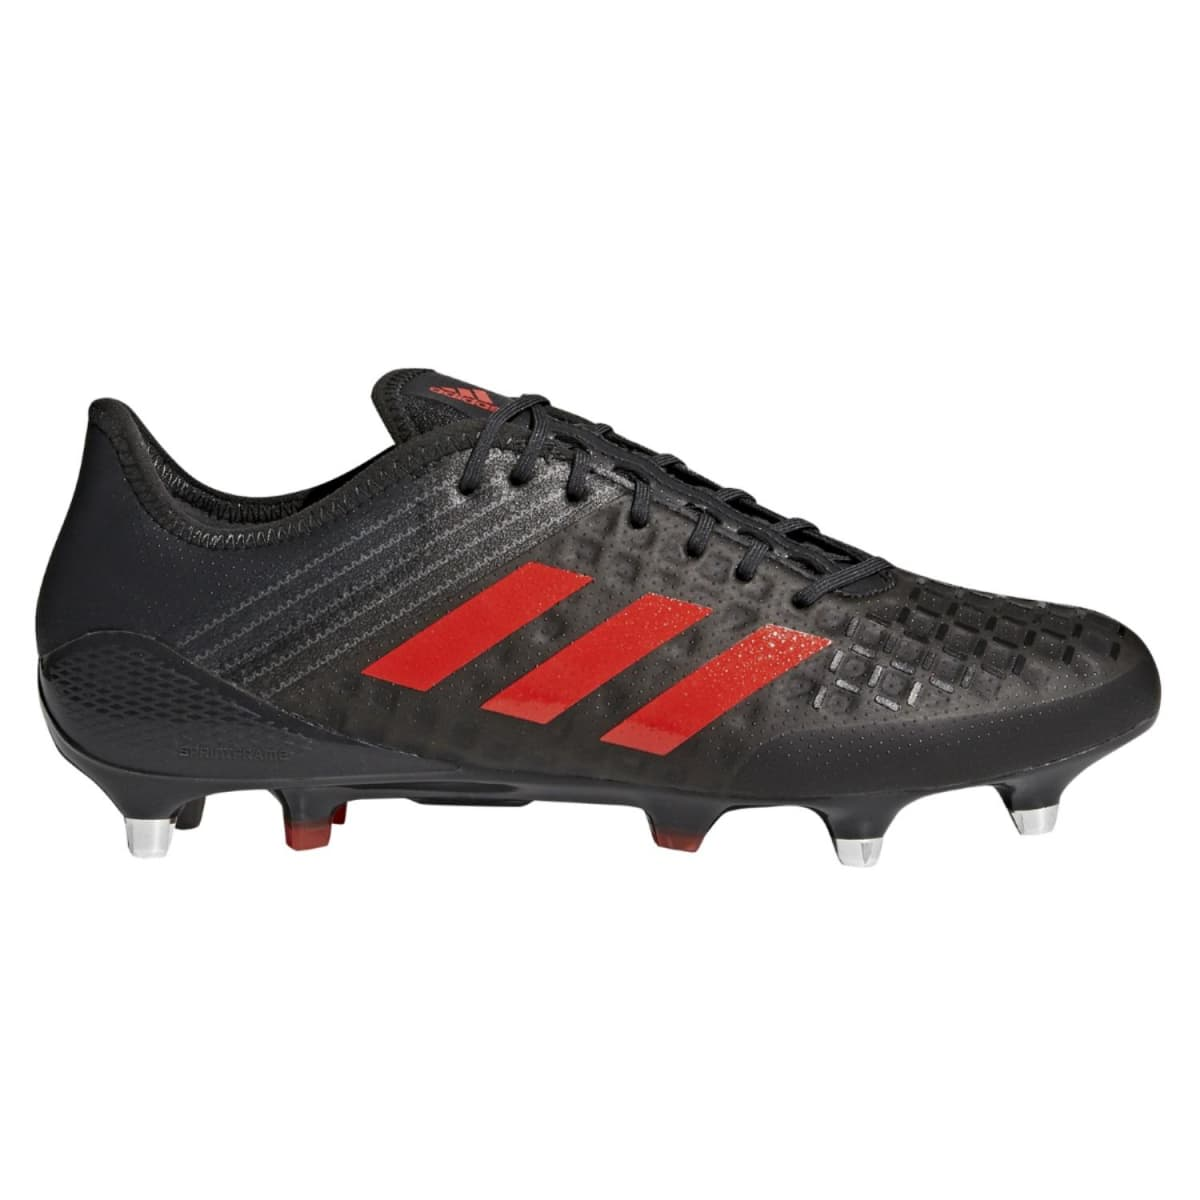 233e23528fe adidas Men s Predator Malice Control SG Rugby Boots